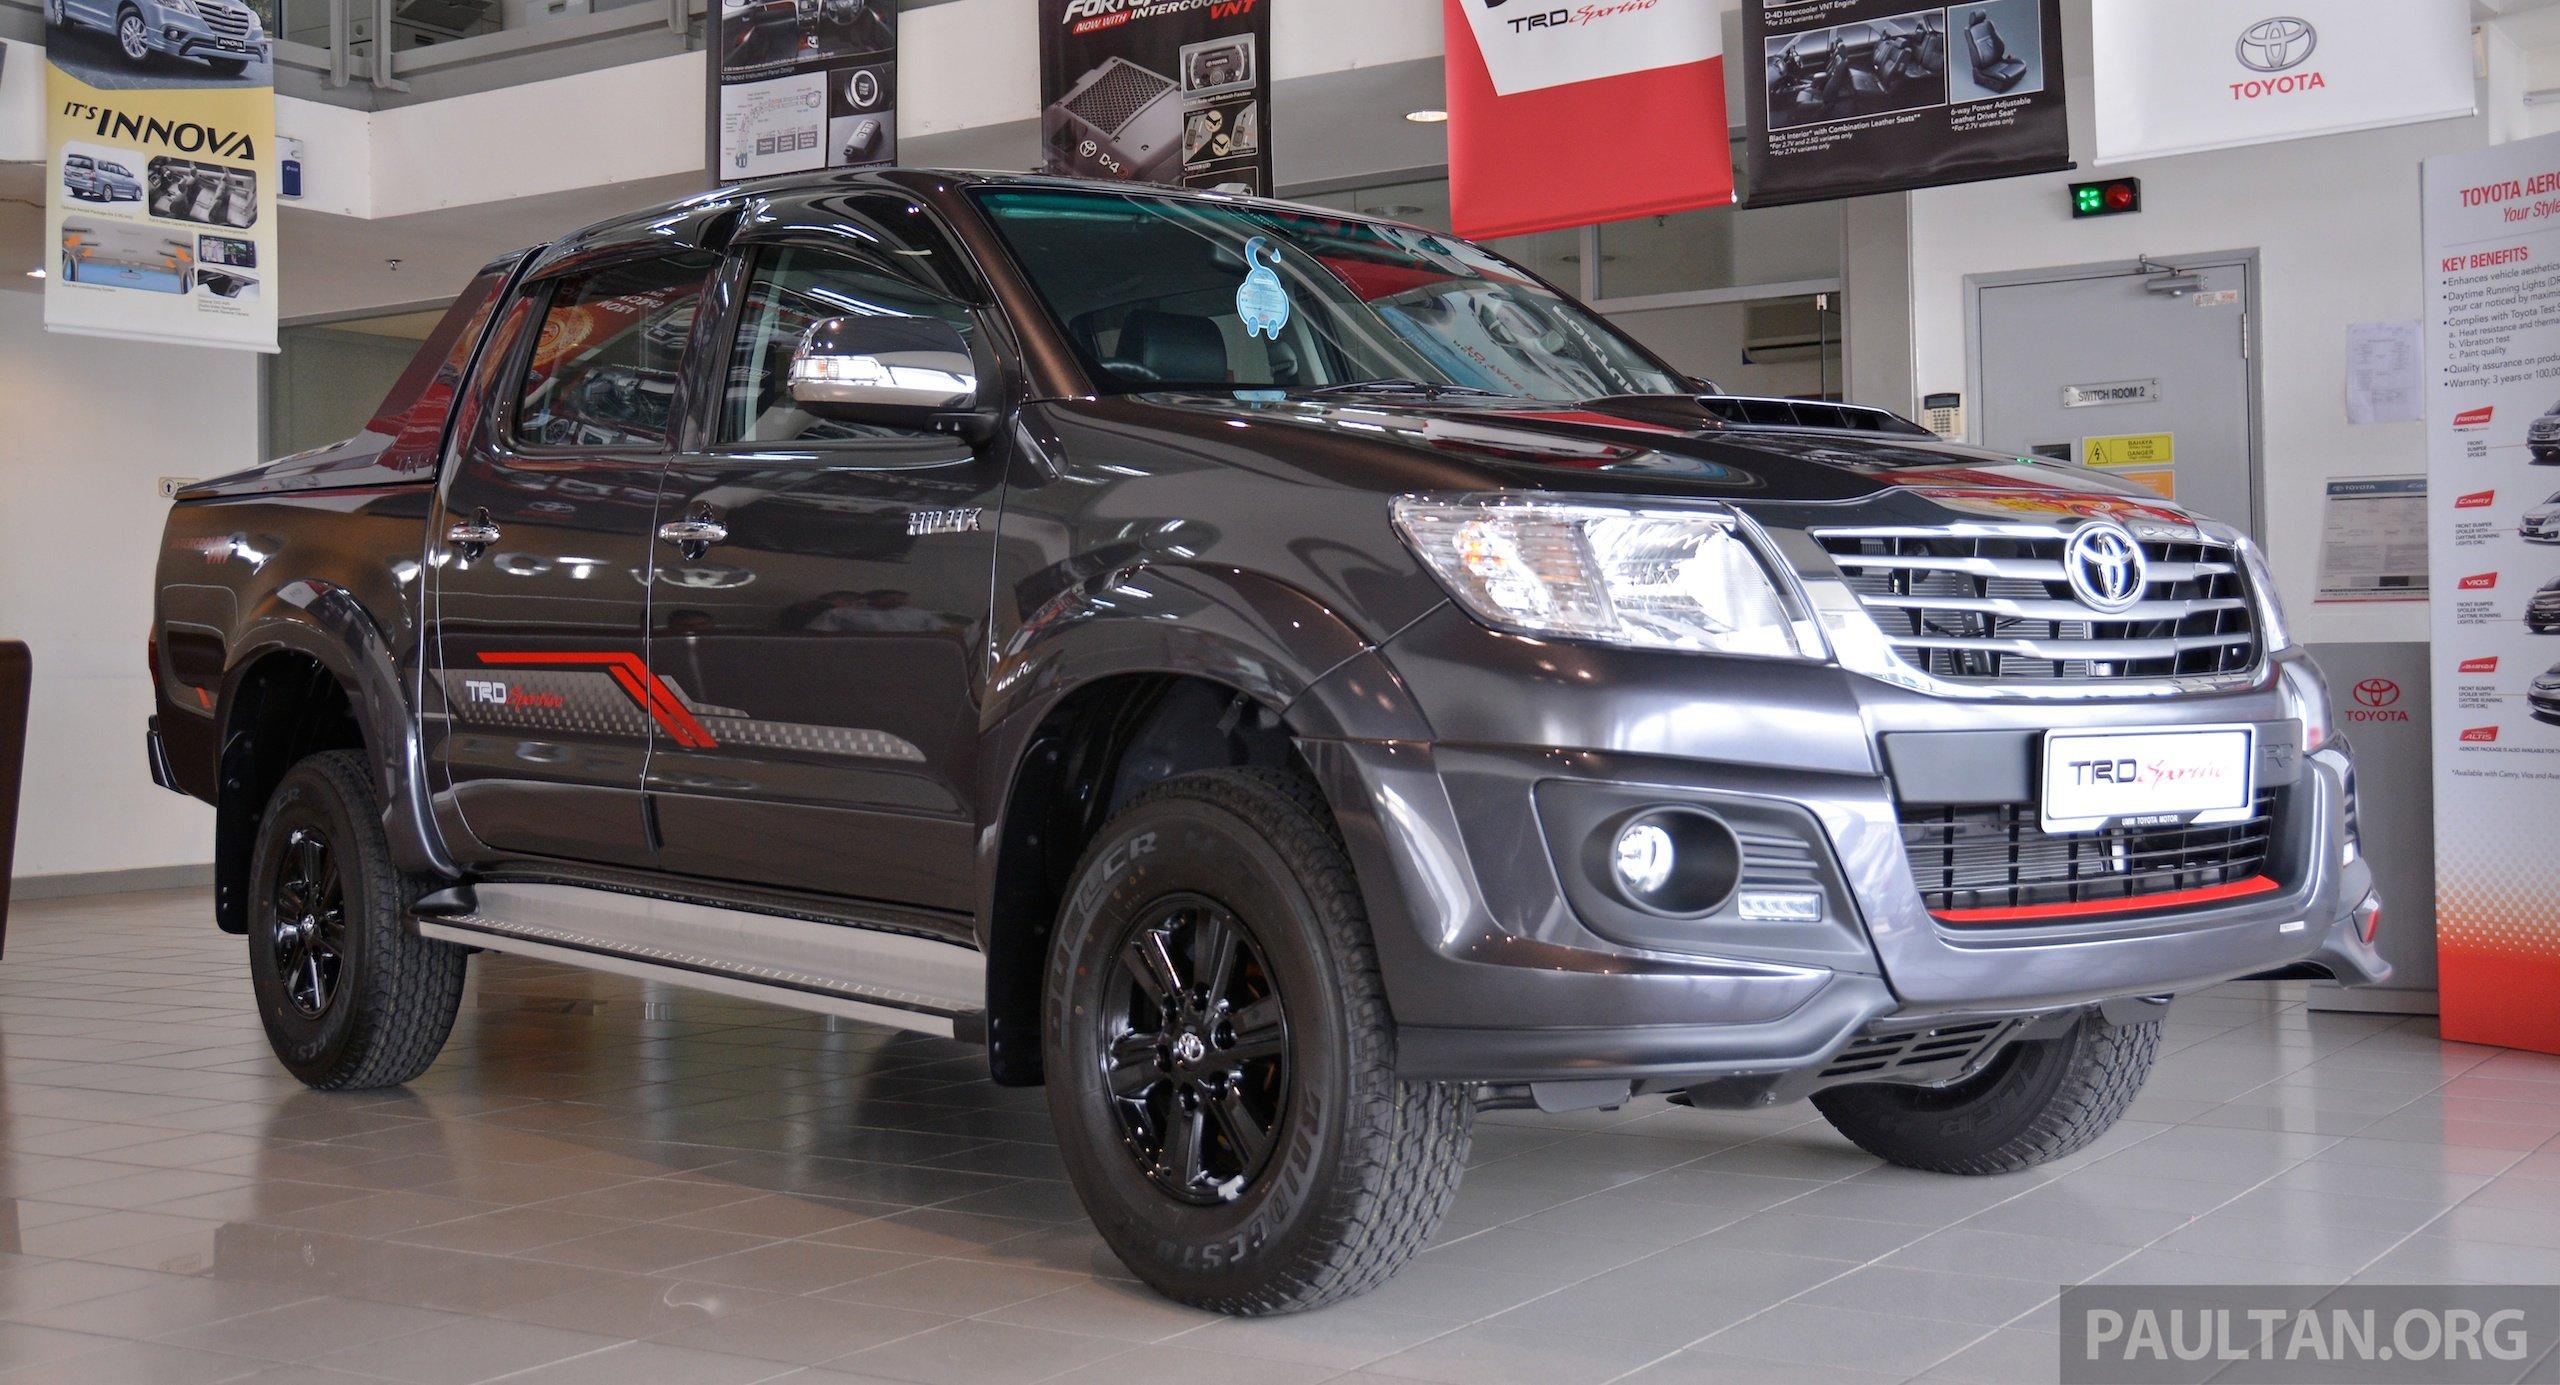 Gallery 2015 Toyota Hilux Trd Sportivo More Aggressive Looks Racier Interior For New